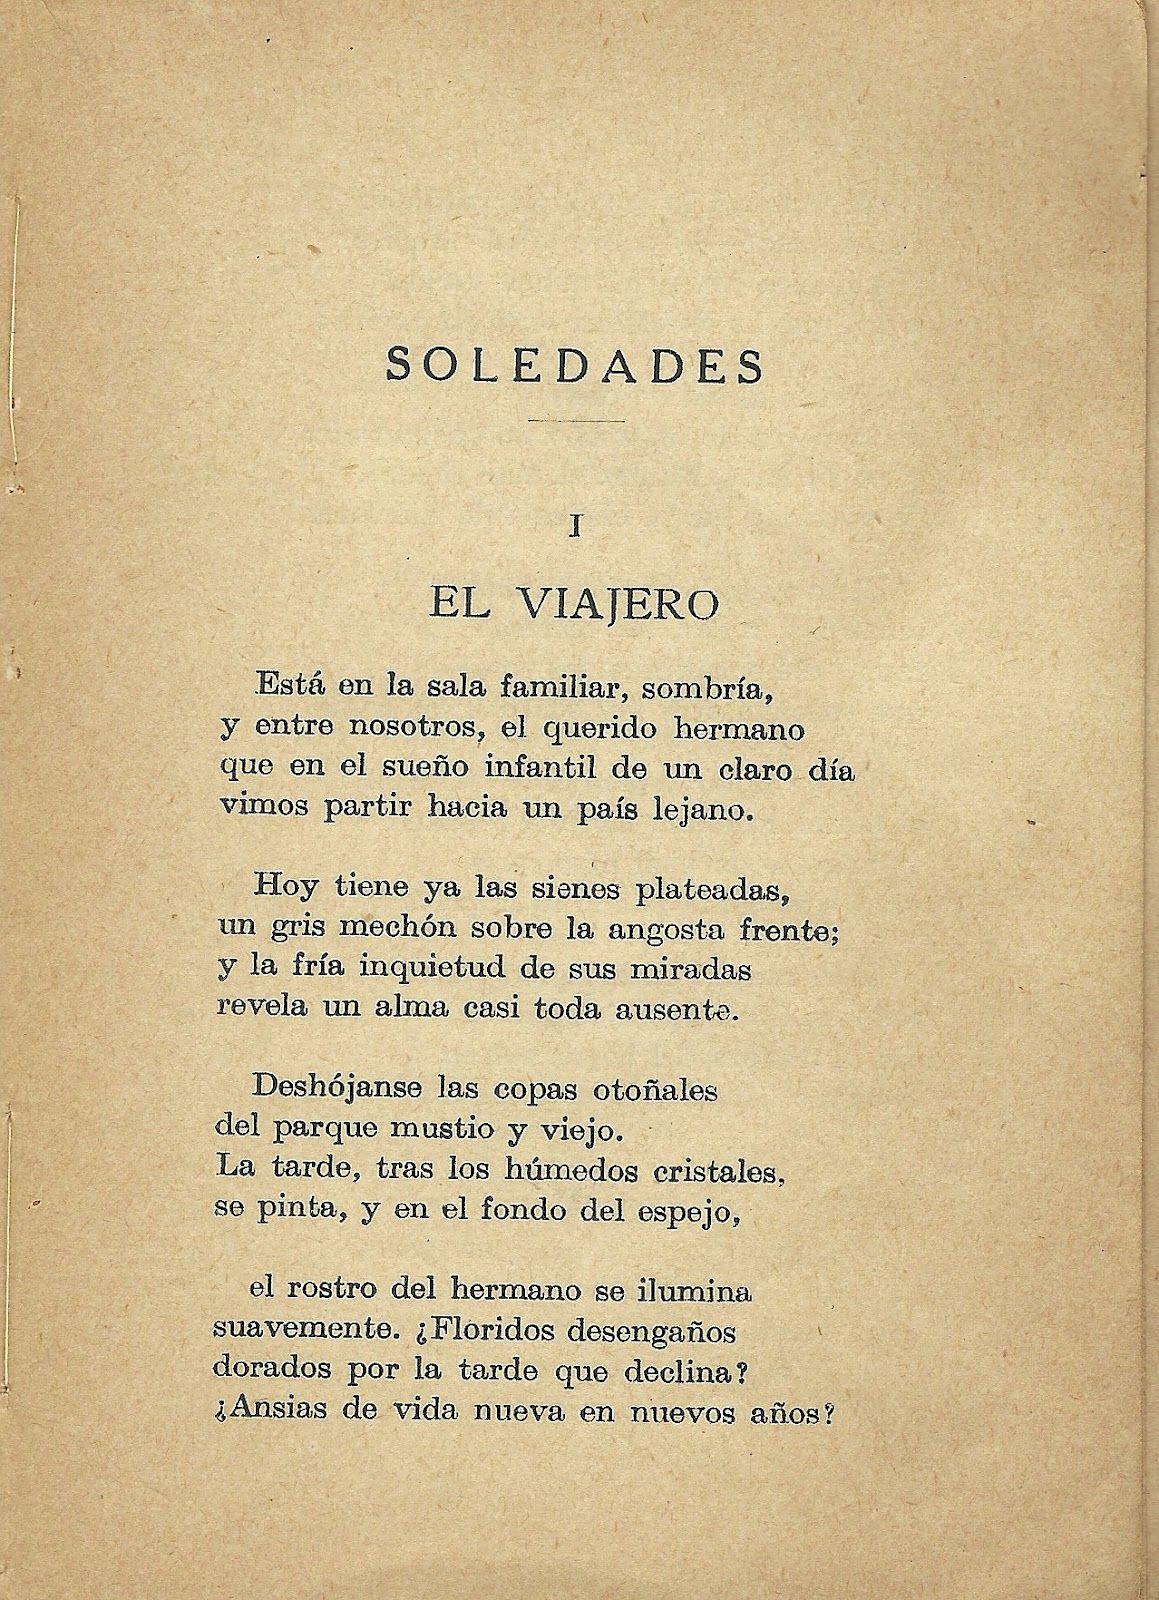 Primera Etapa Modernismo Simbolista Antonio Machado Publica El